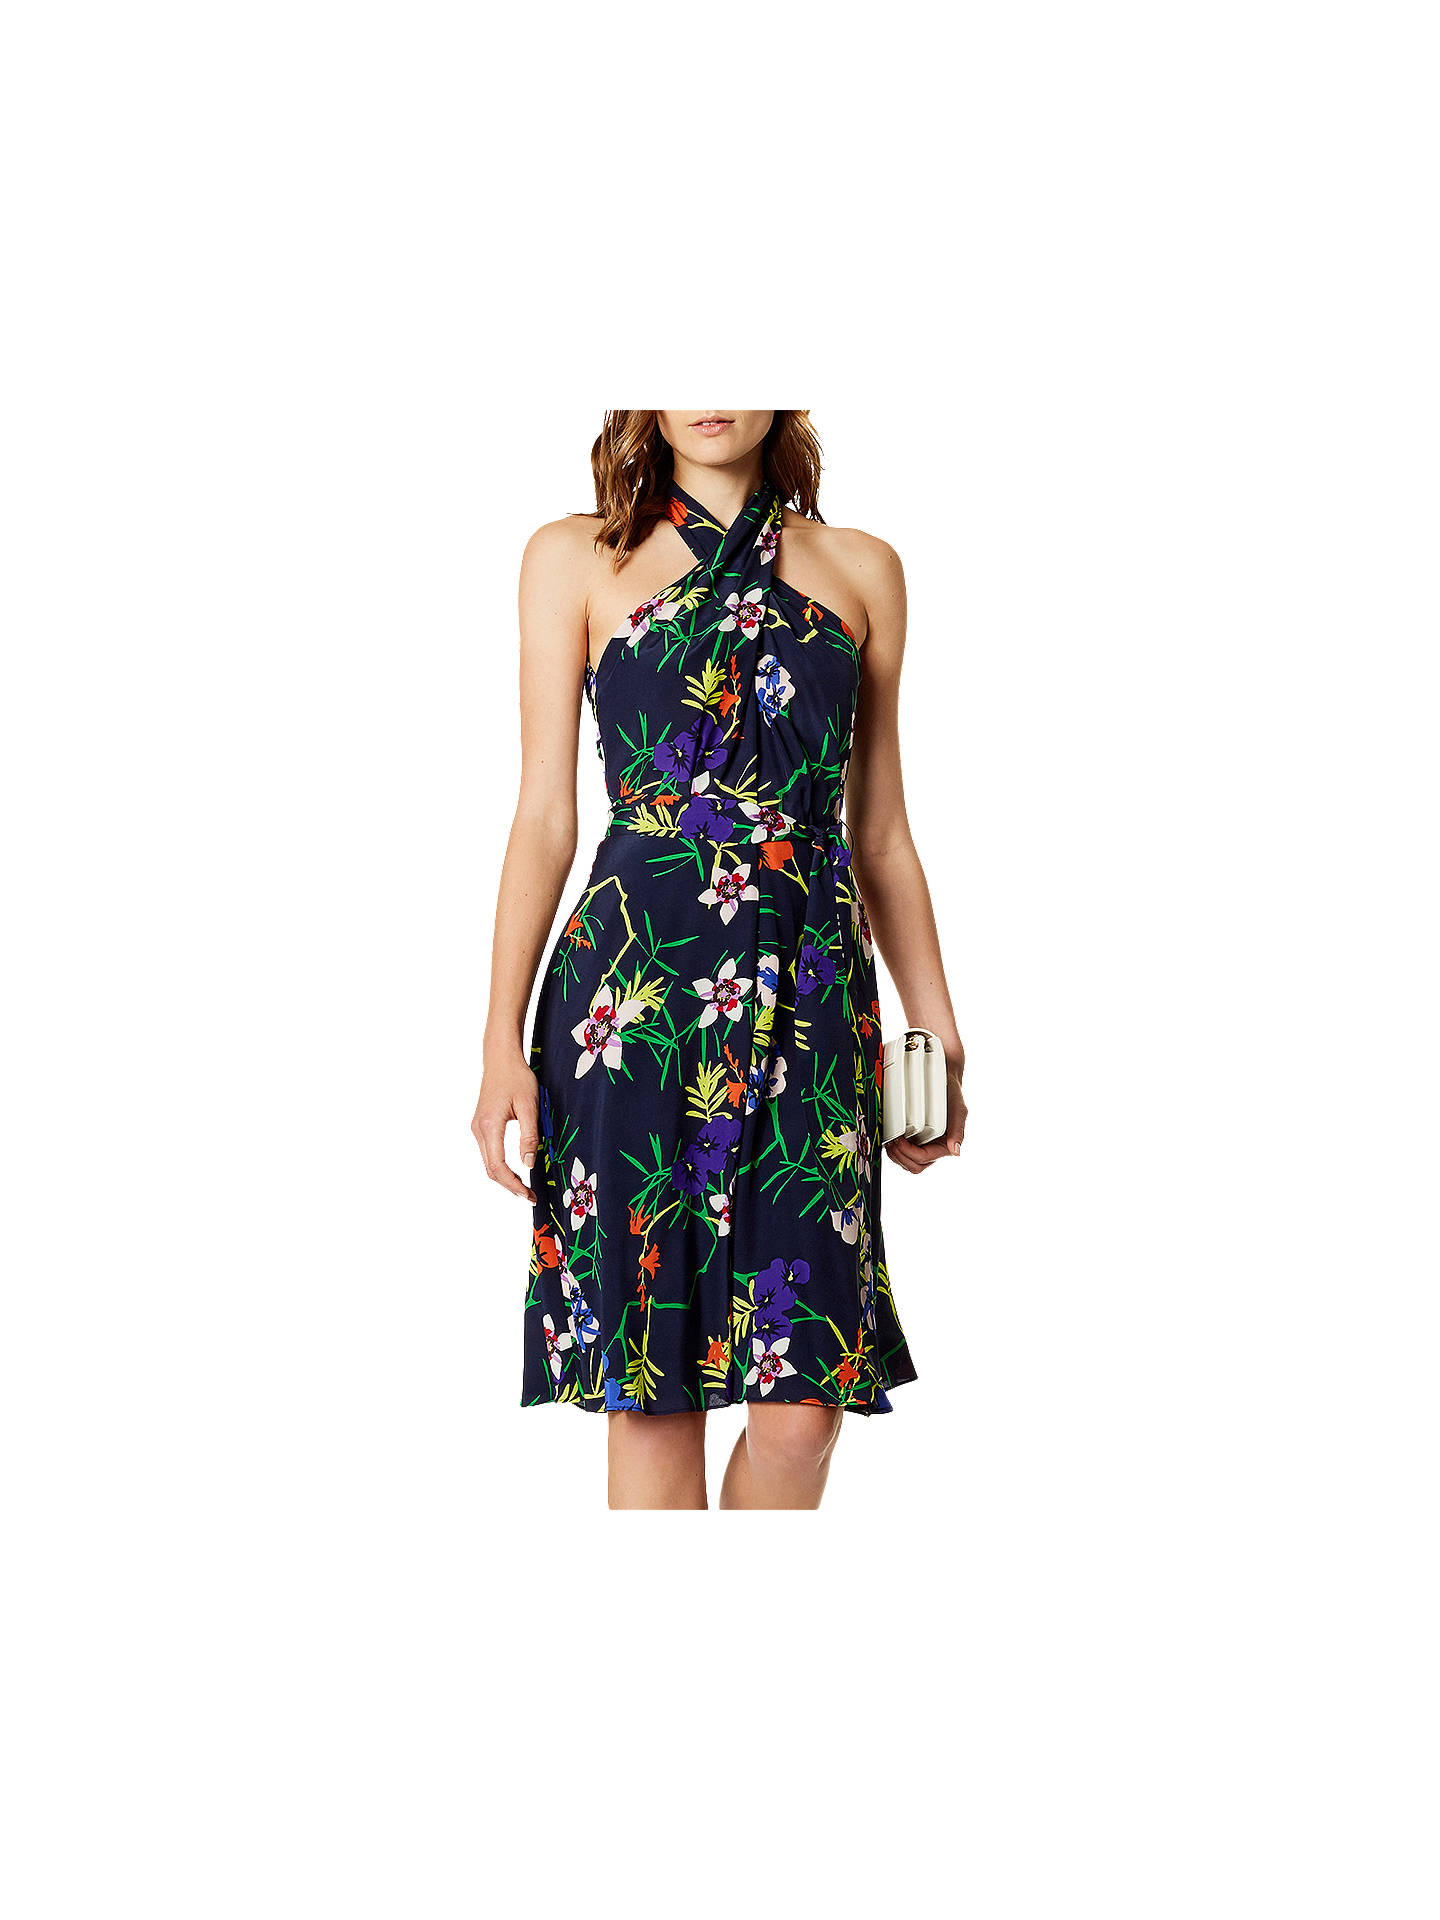 316f54ecc1 ... Buy Karen Millen Fresh Floral Silk Dress